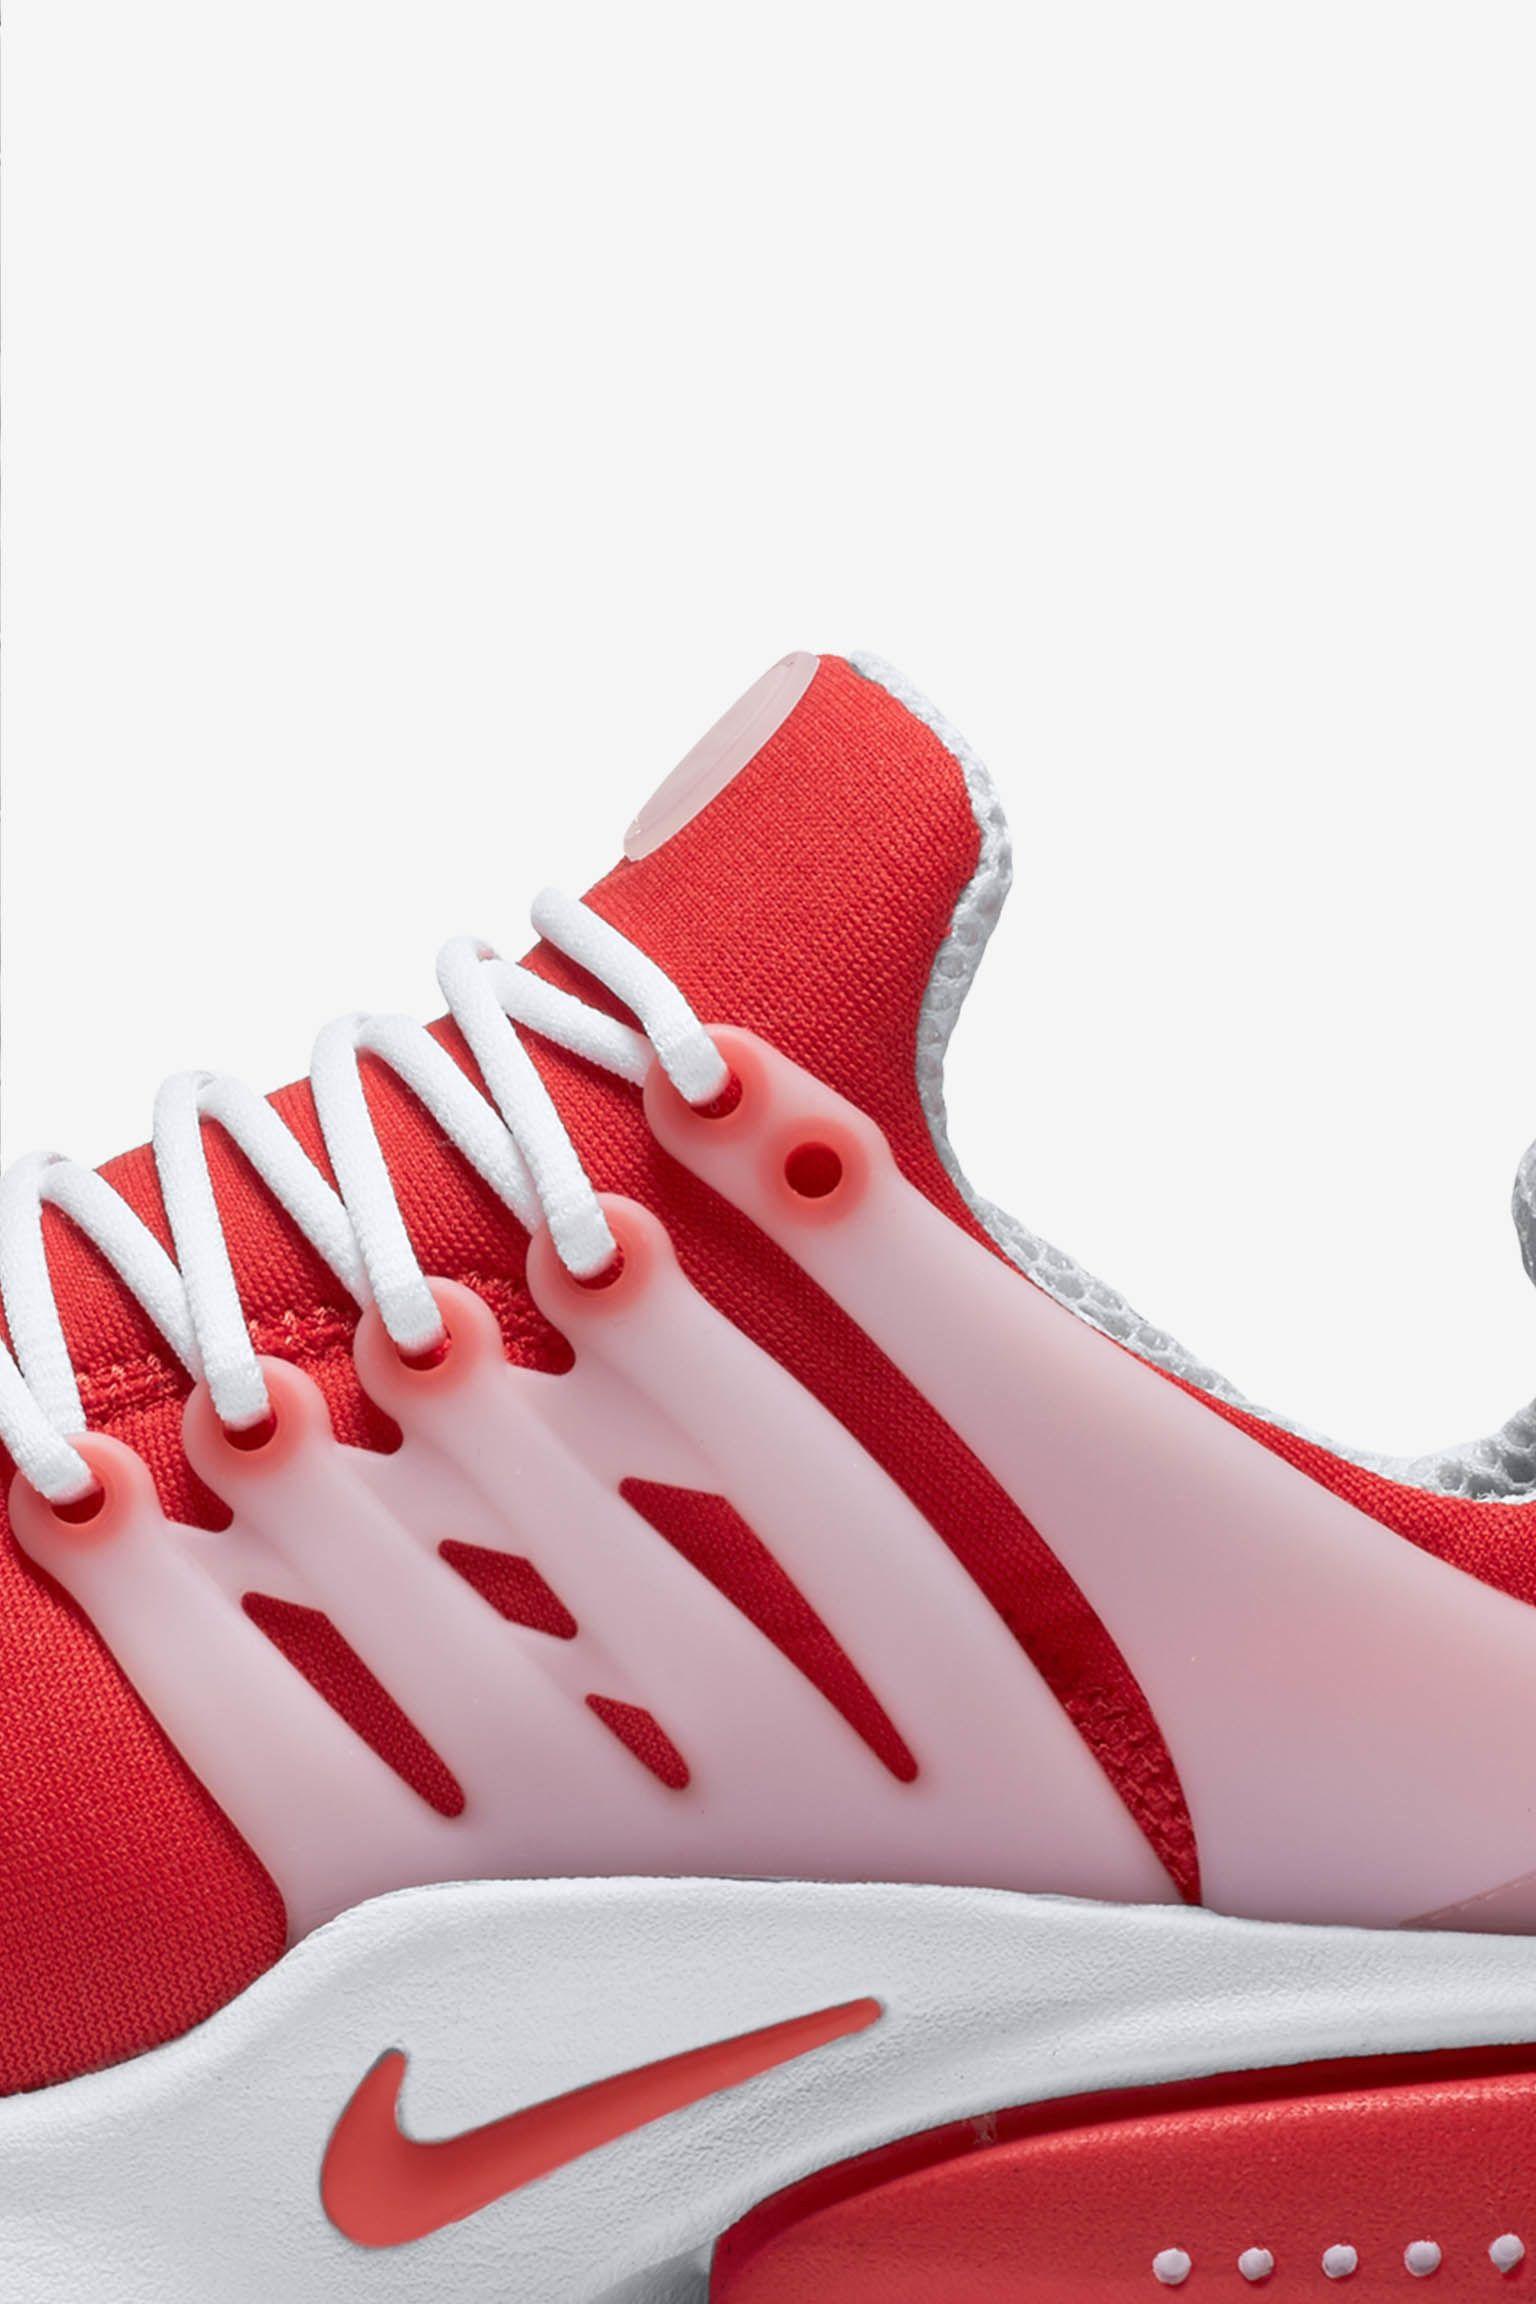 Nike Air Presto 'Comet Red' Release Date